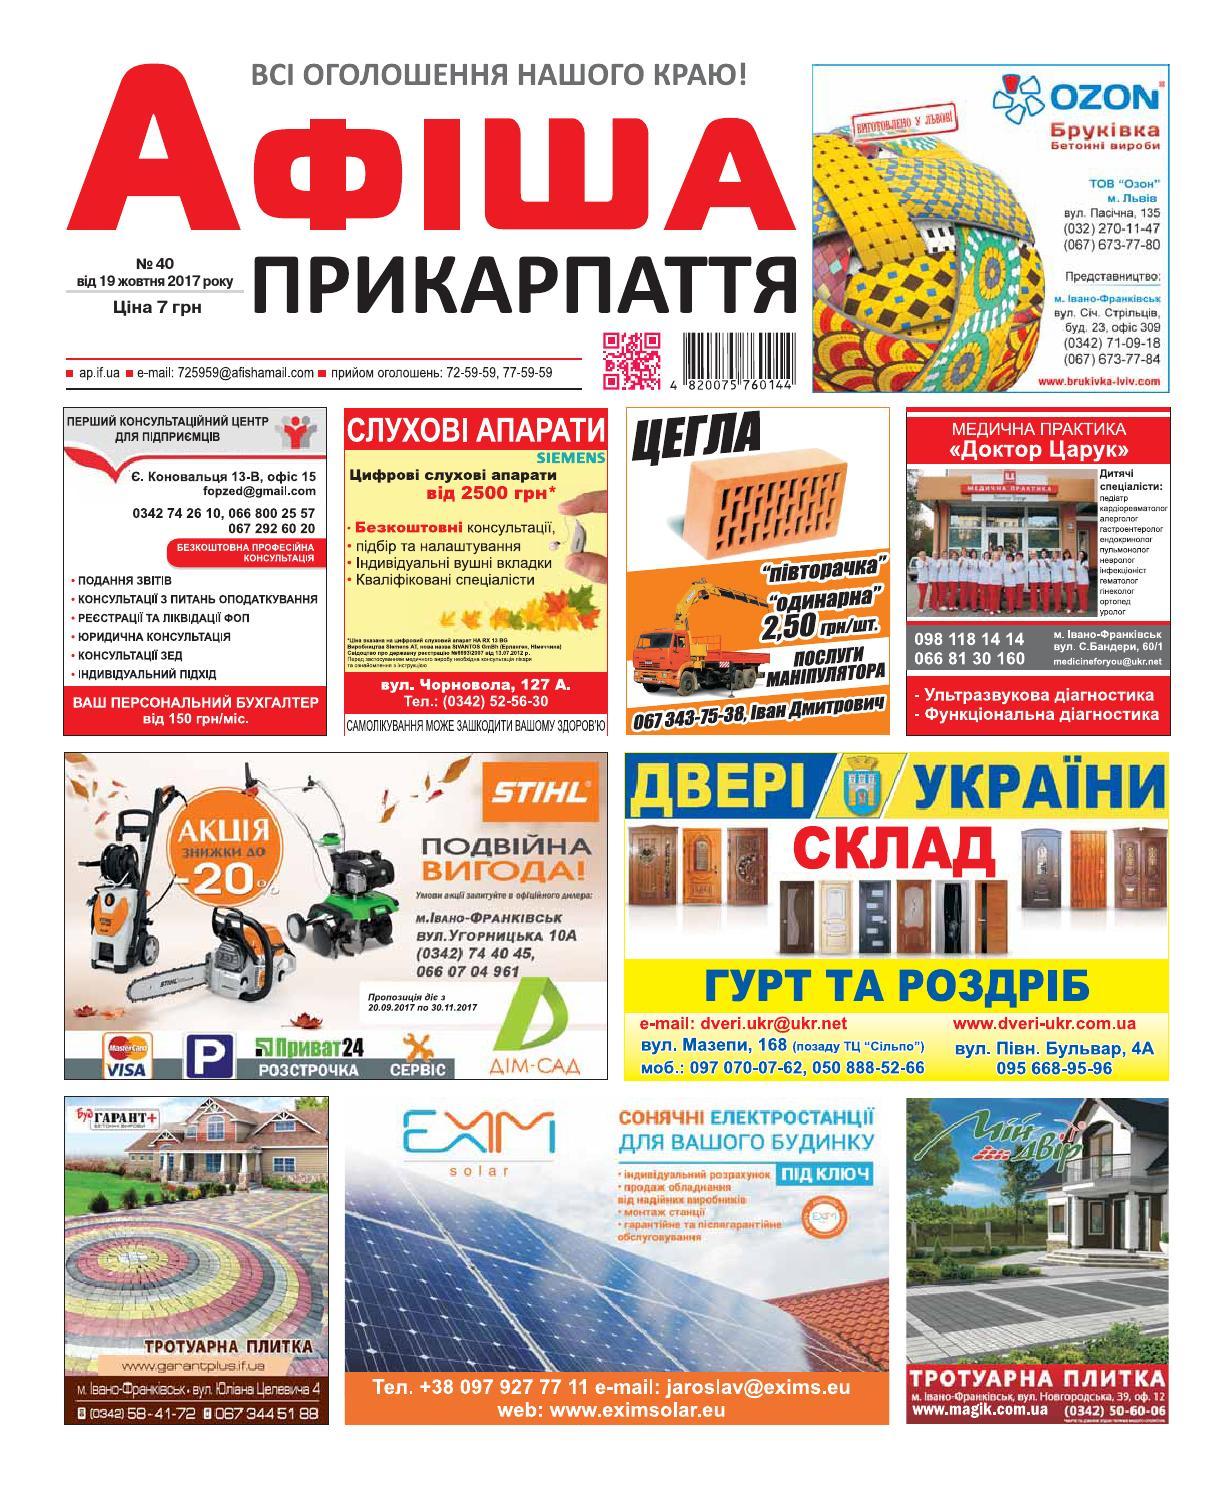 Афіша Прикарпаття 40 by Olya Olya - issuu bd934779ed741